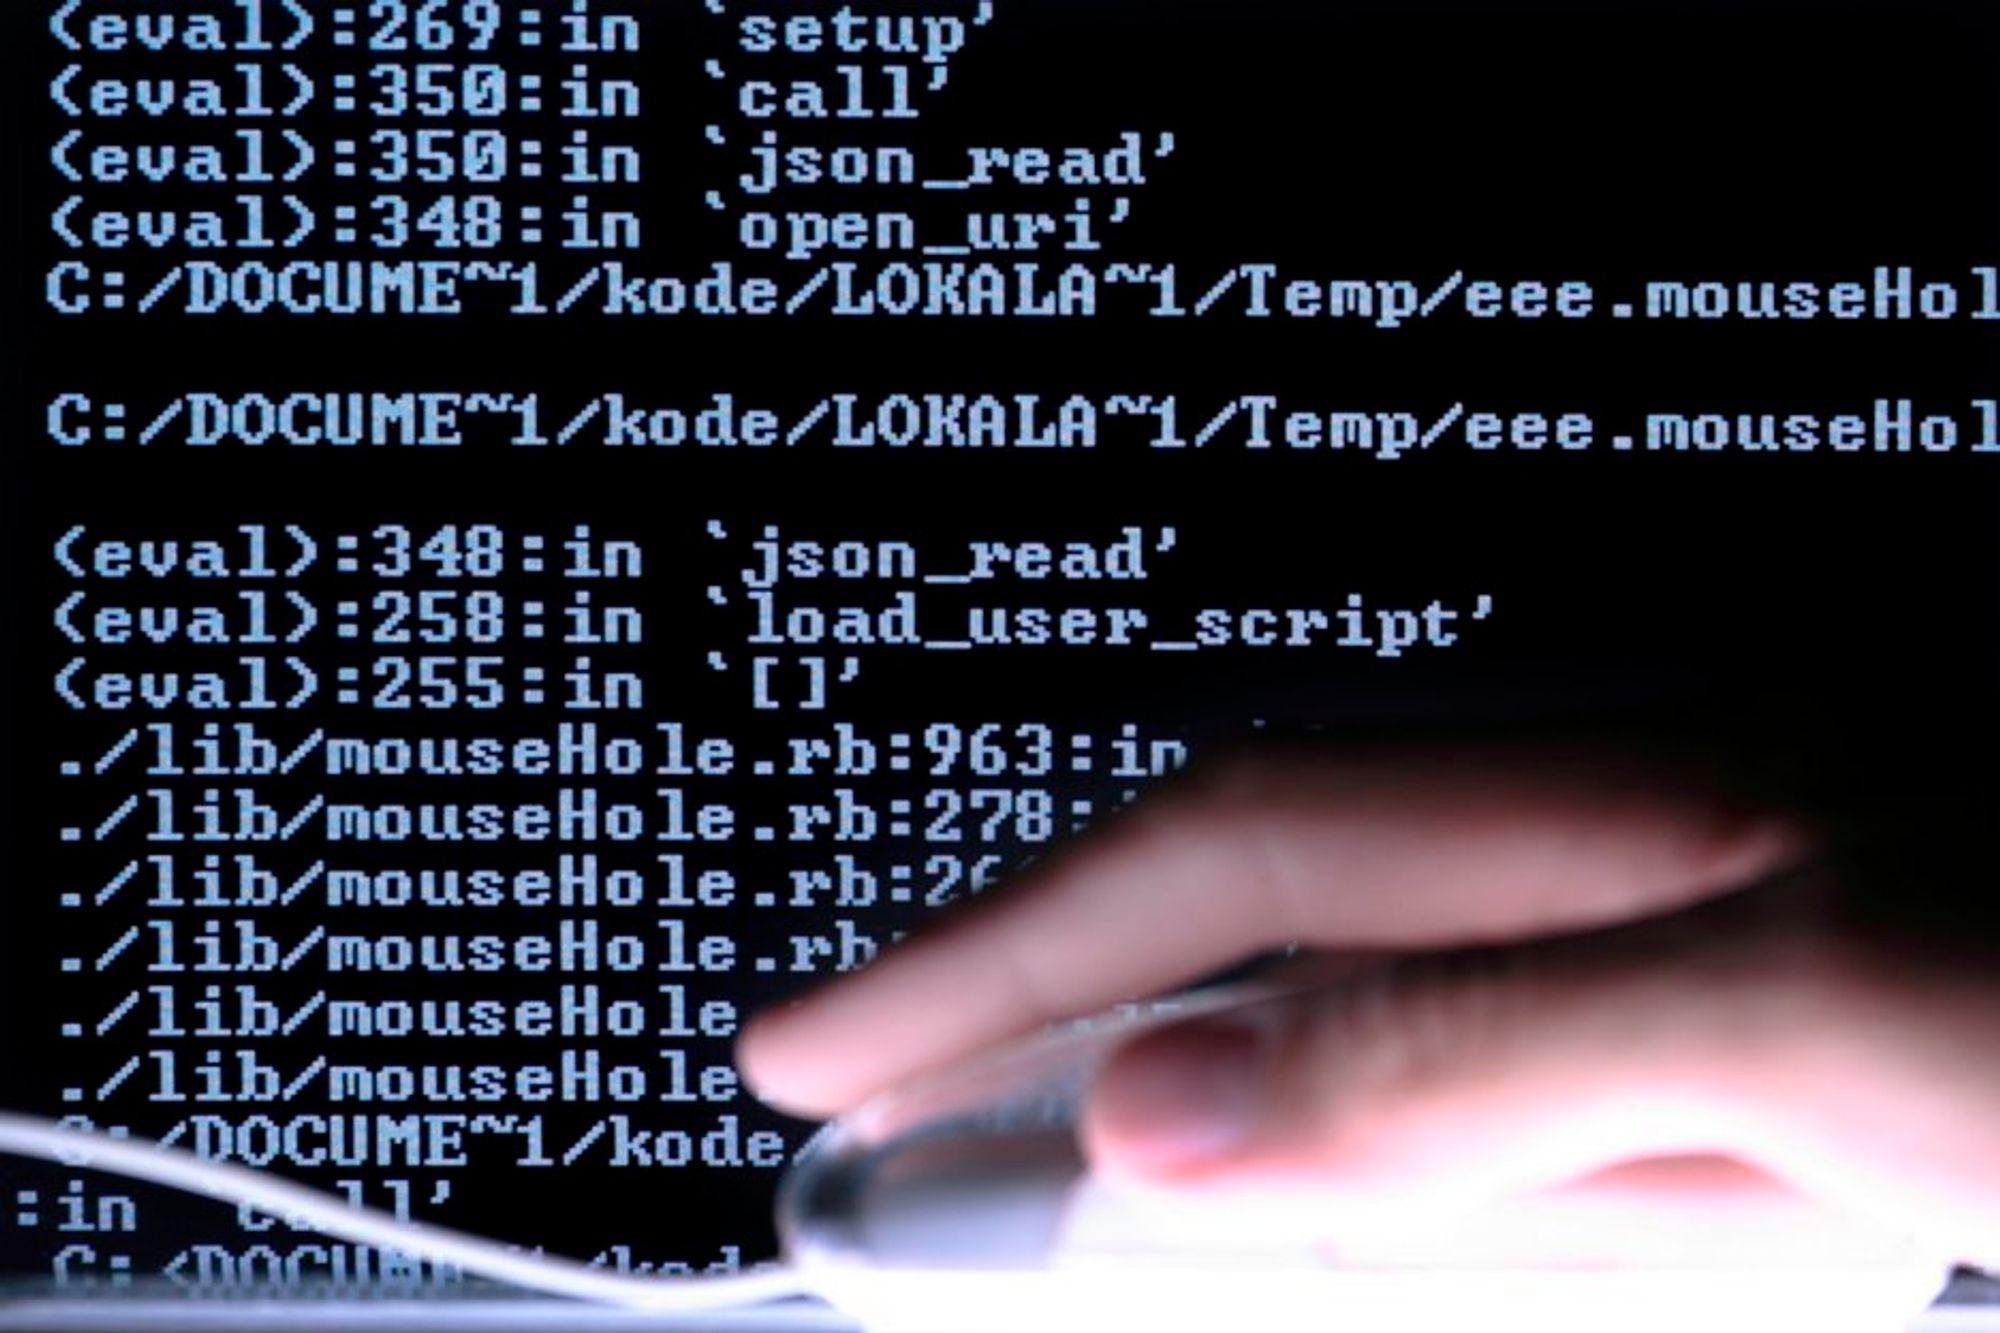 CYBERKRIG?: Stadig flere spekulerer på om Stuxnet-ormen, som også har rammet Norge, kan være politisk motivert.